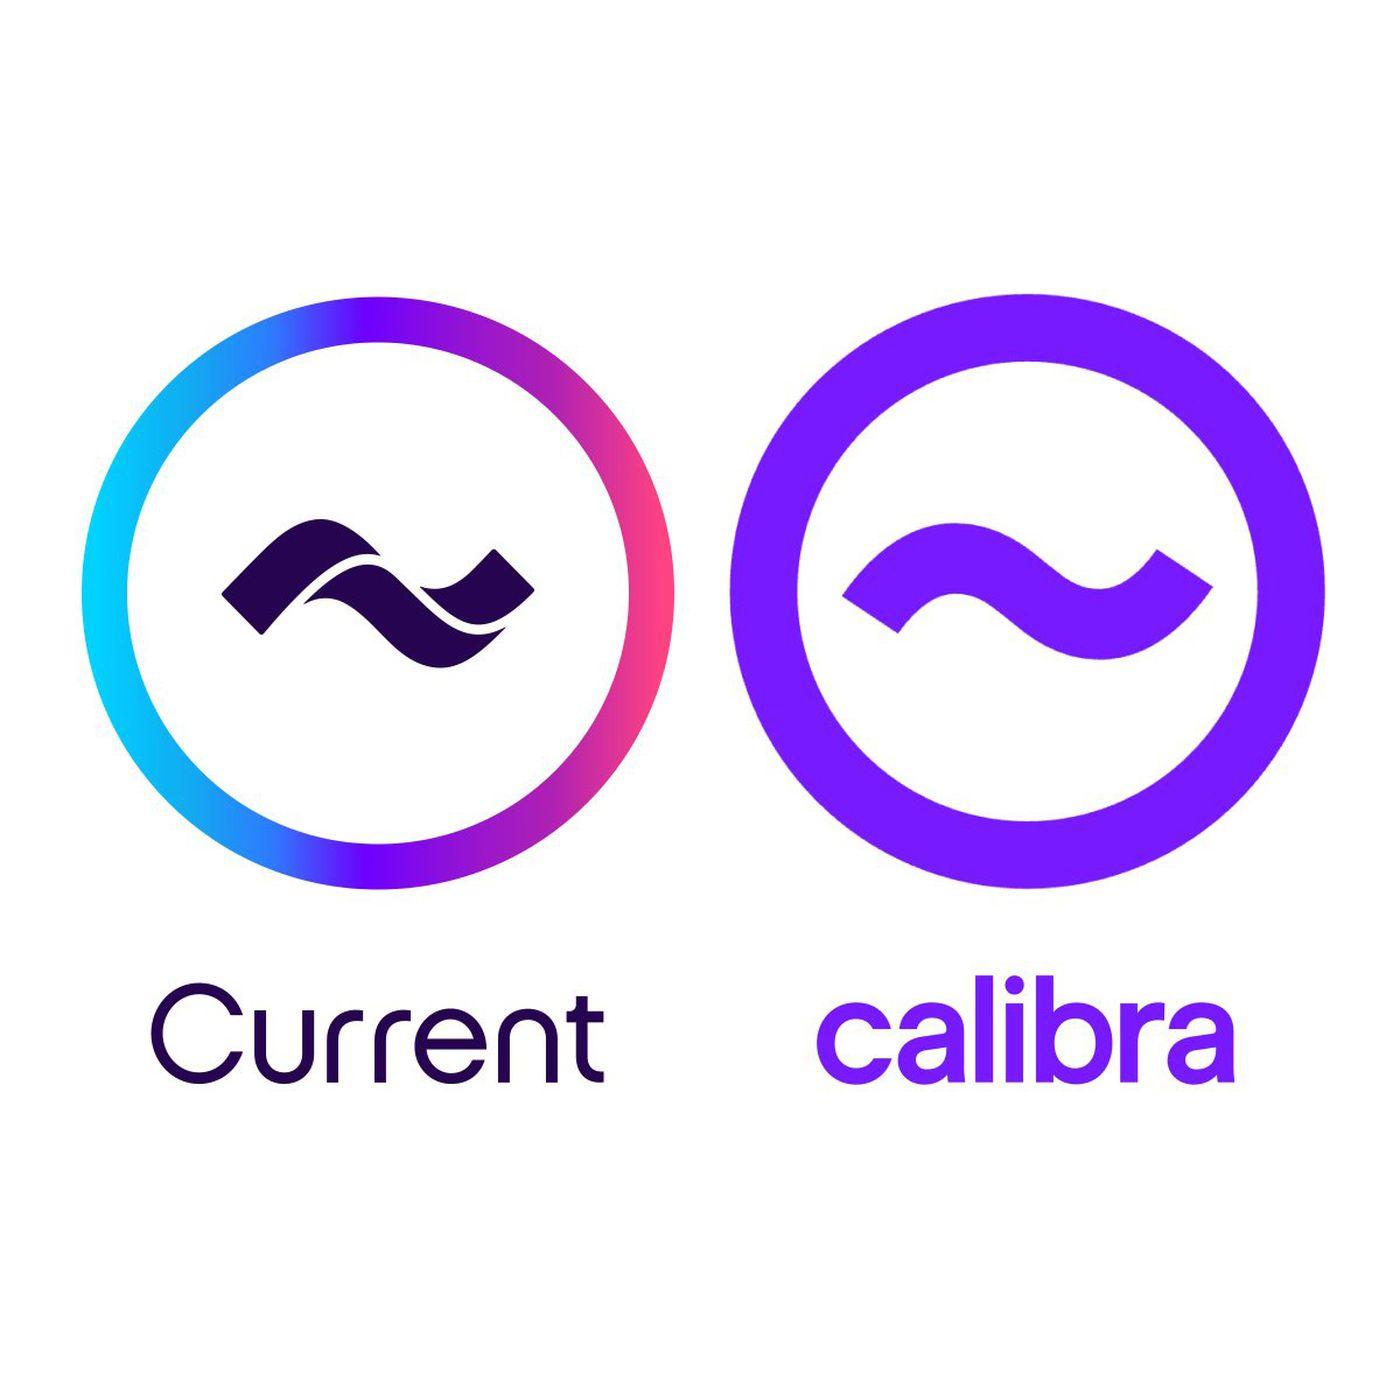 Facebook's Calibra logo looks very familiar - The Verge